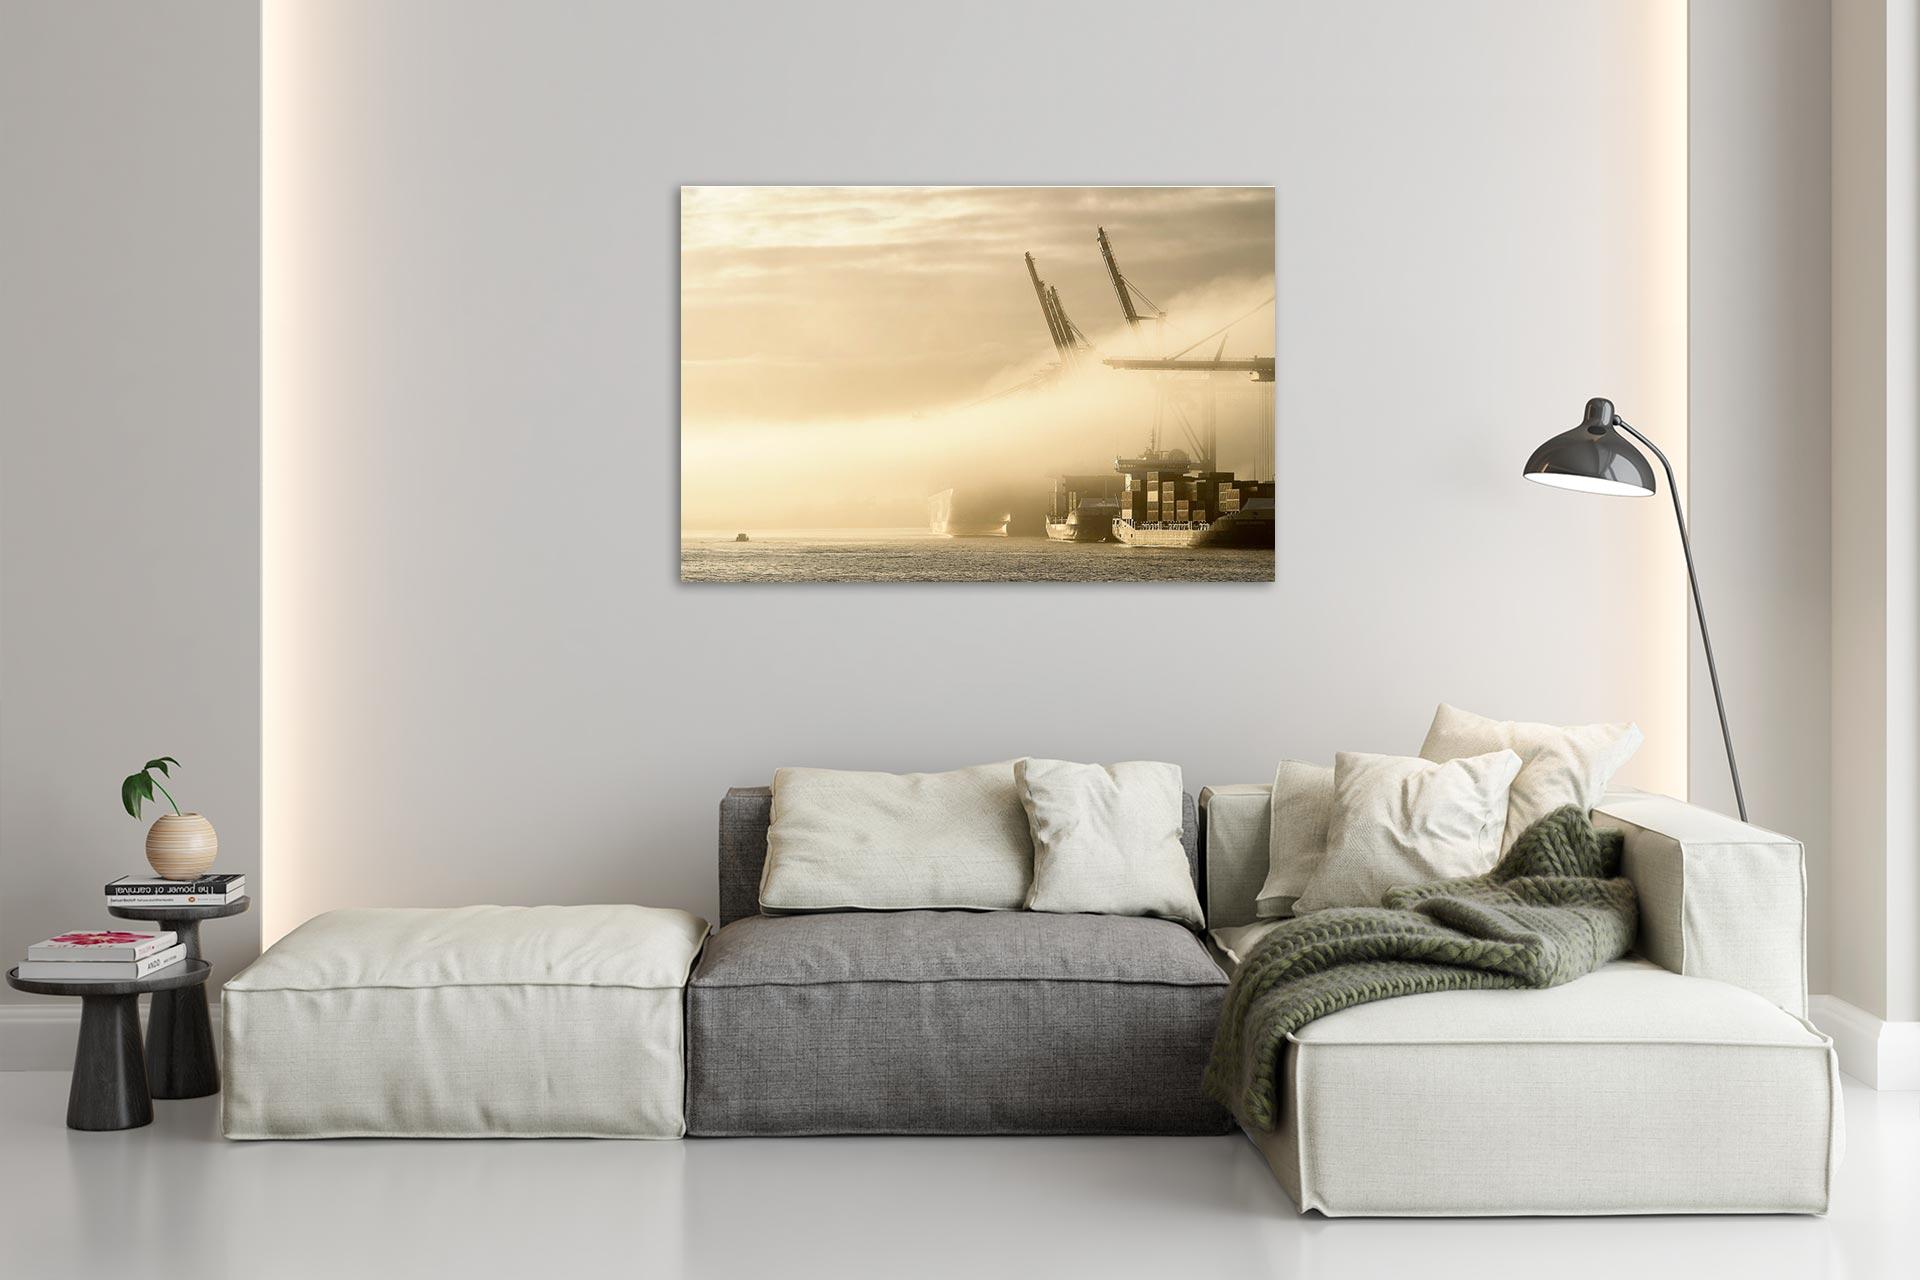 LCW229-hamburg-wandbild-bild-auf-leinwand-acrylglas-aludibond-wohnzimmer